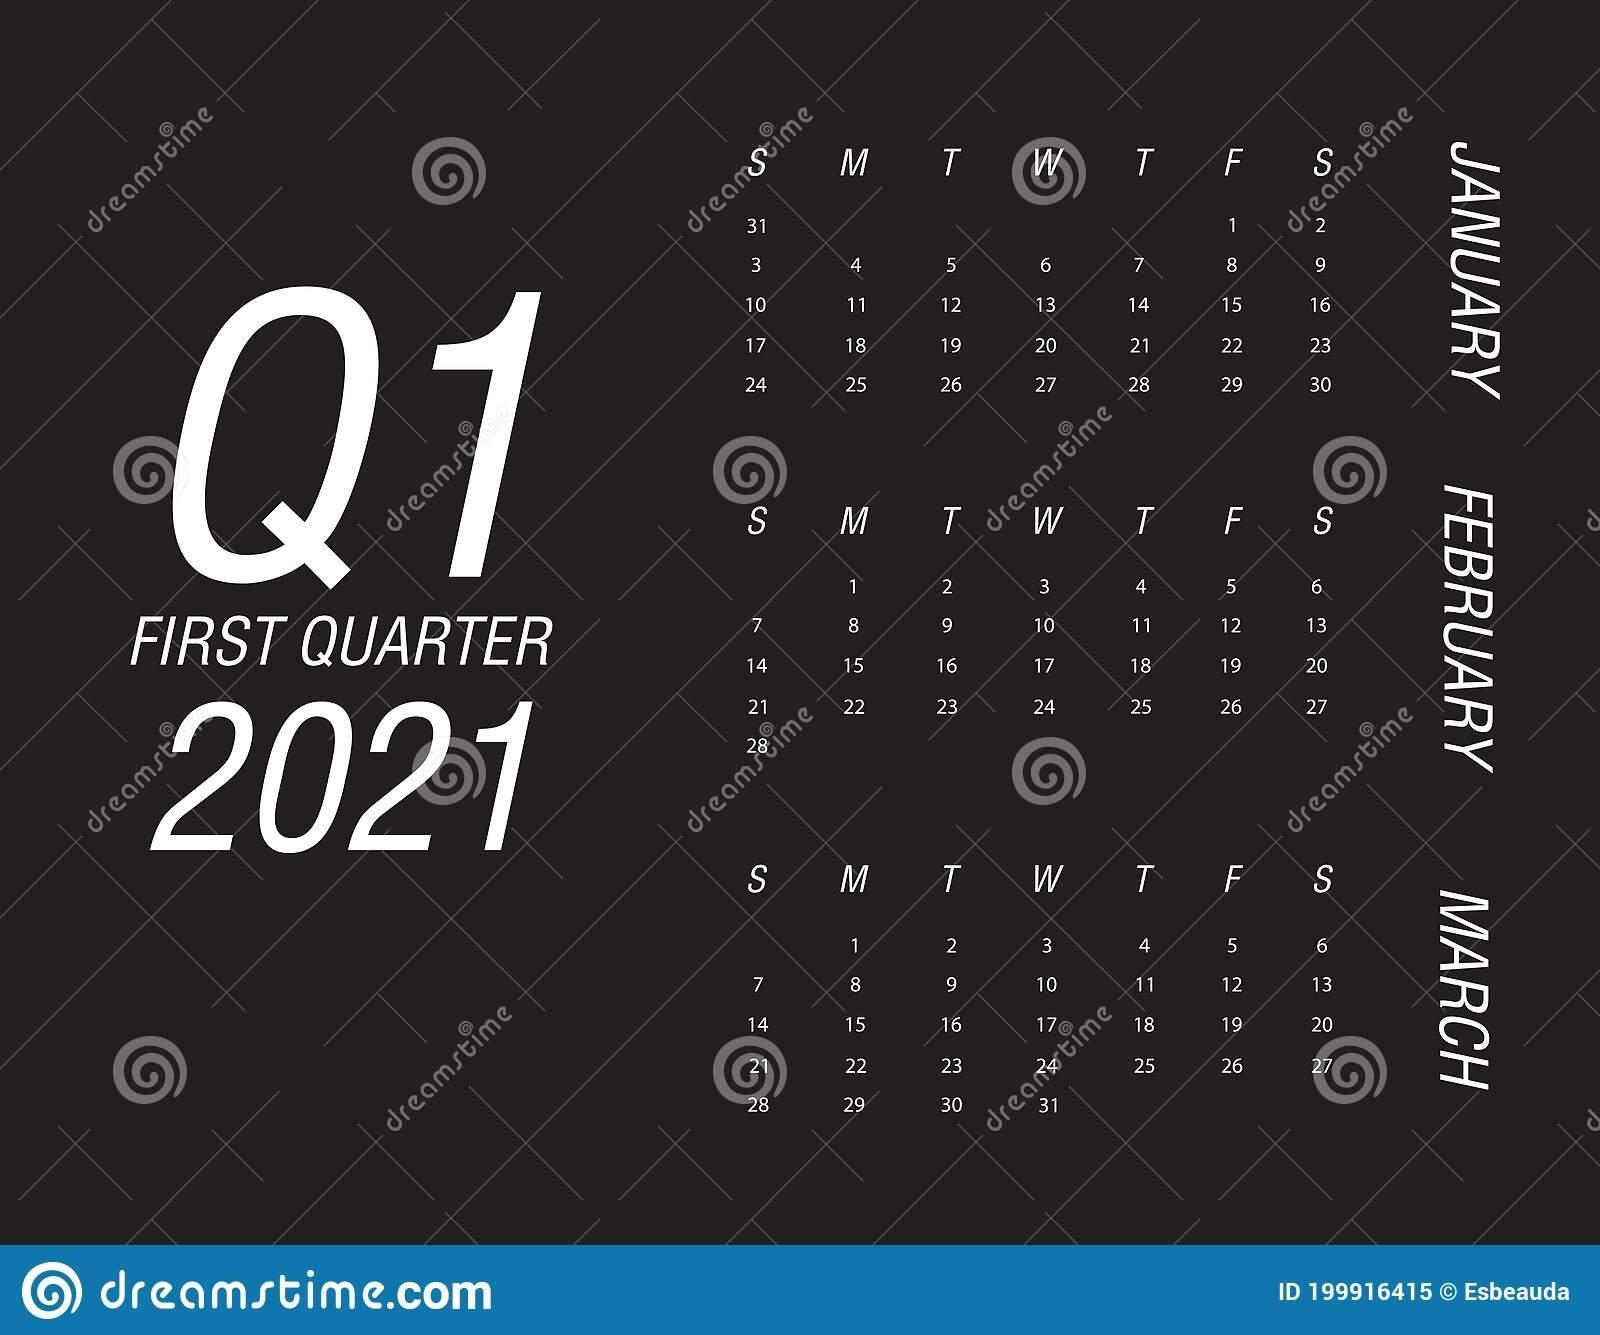 First Quarter Of Calendar 2021 Stock Vector - Illustration